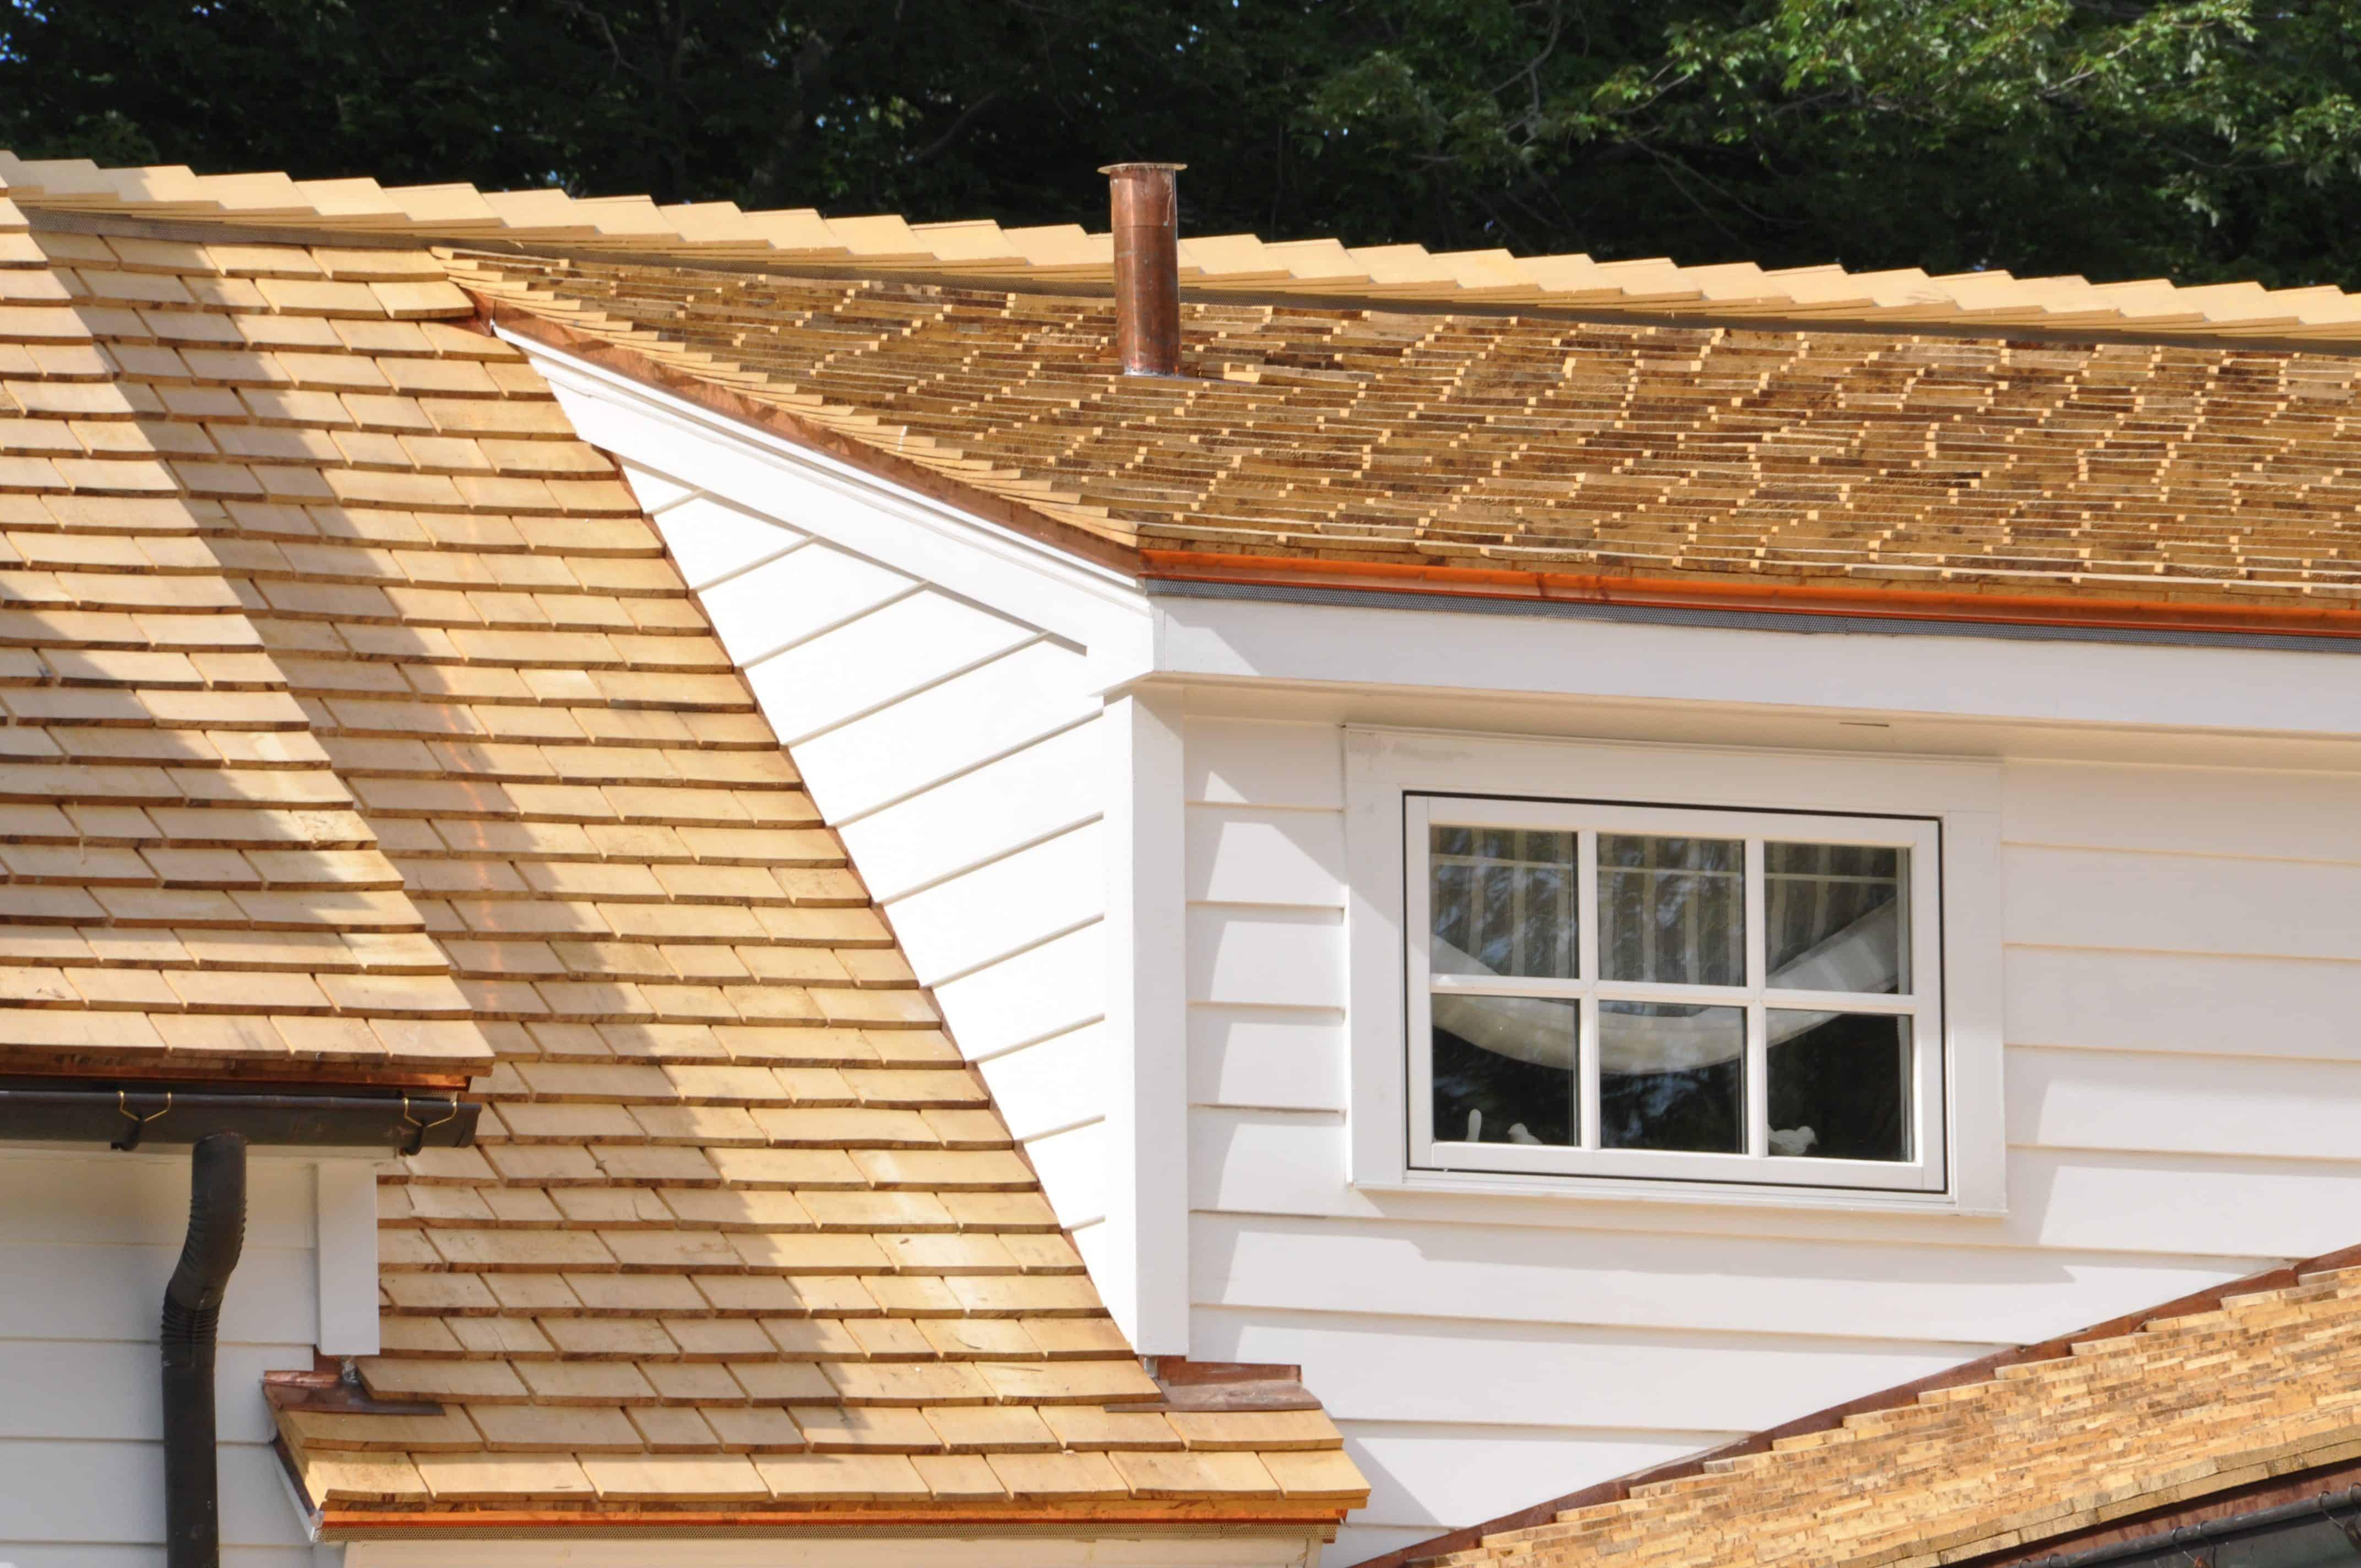 4 Warning Signs That You Need Cedar Shake Roof Repair